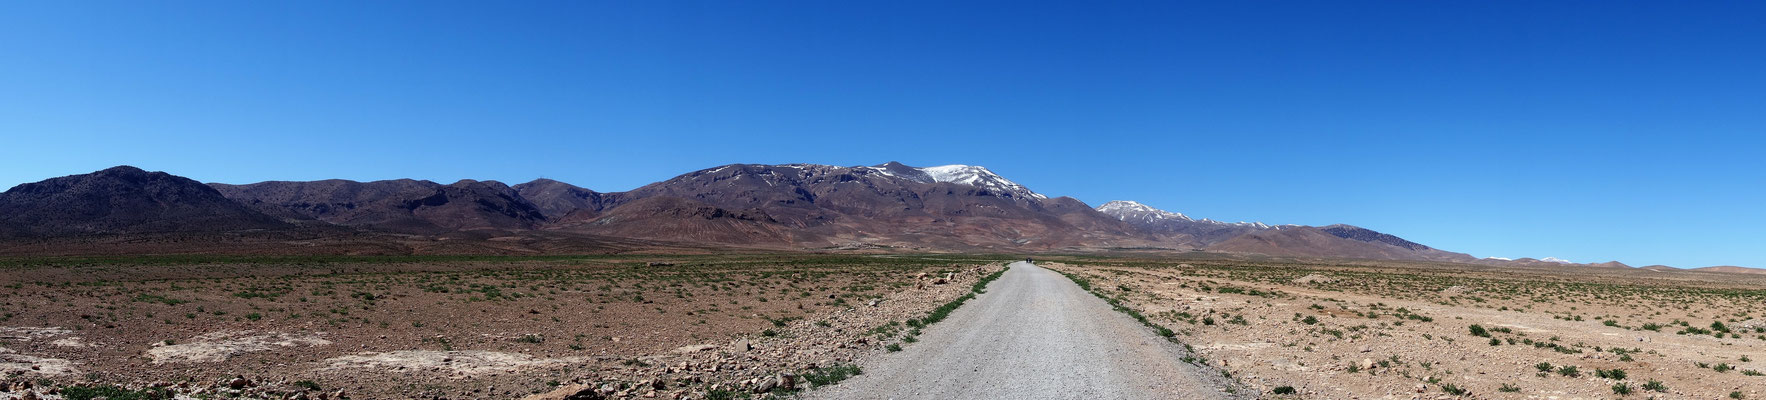 Blick aufs Atlasgebirge